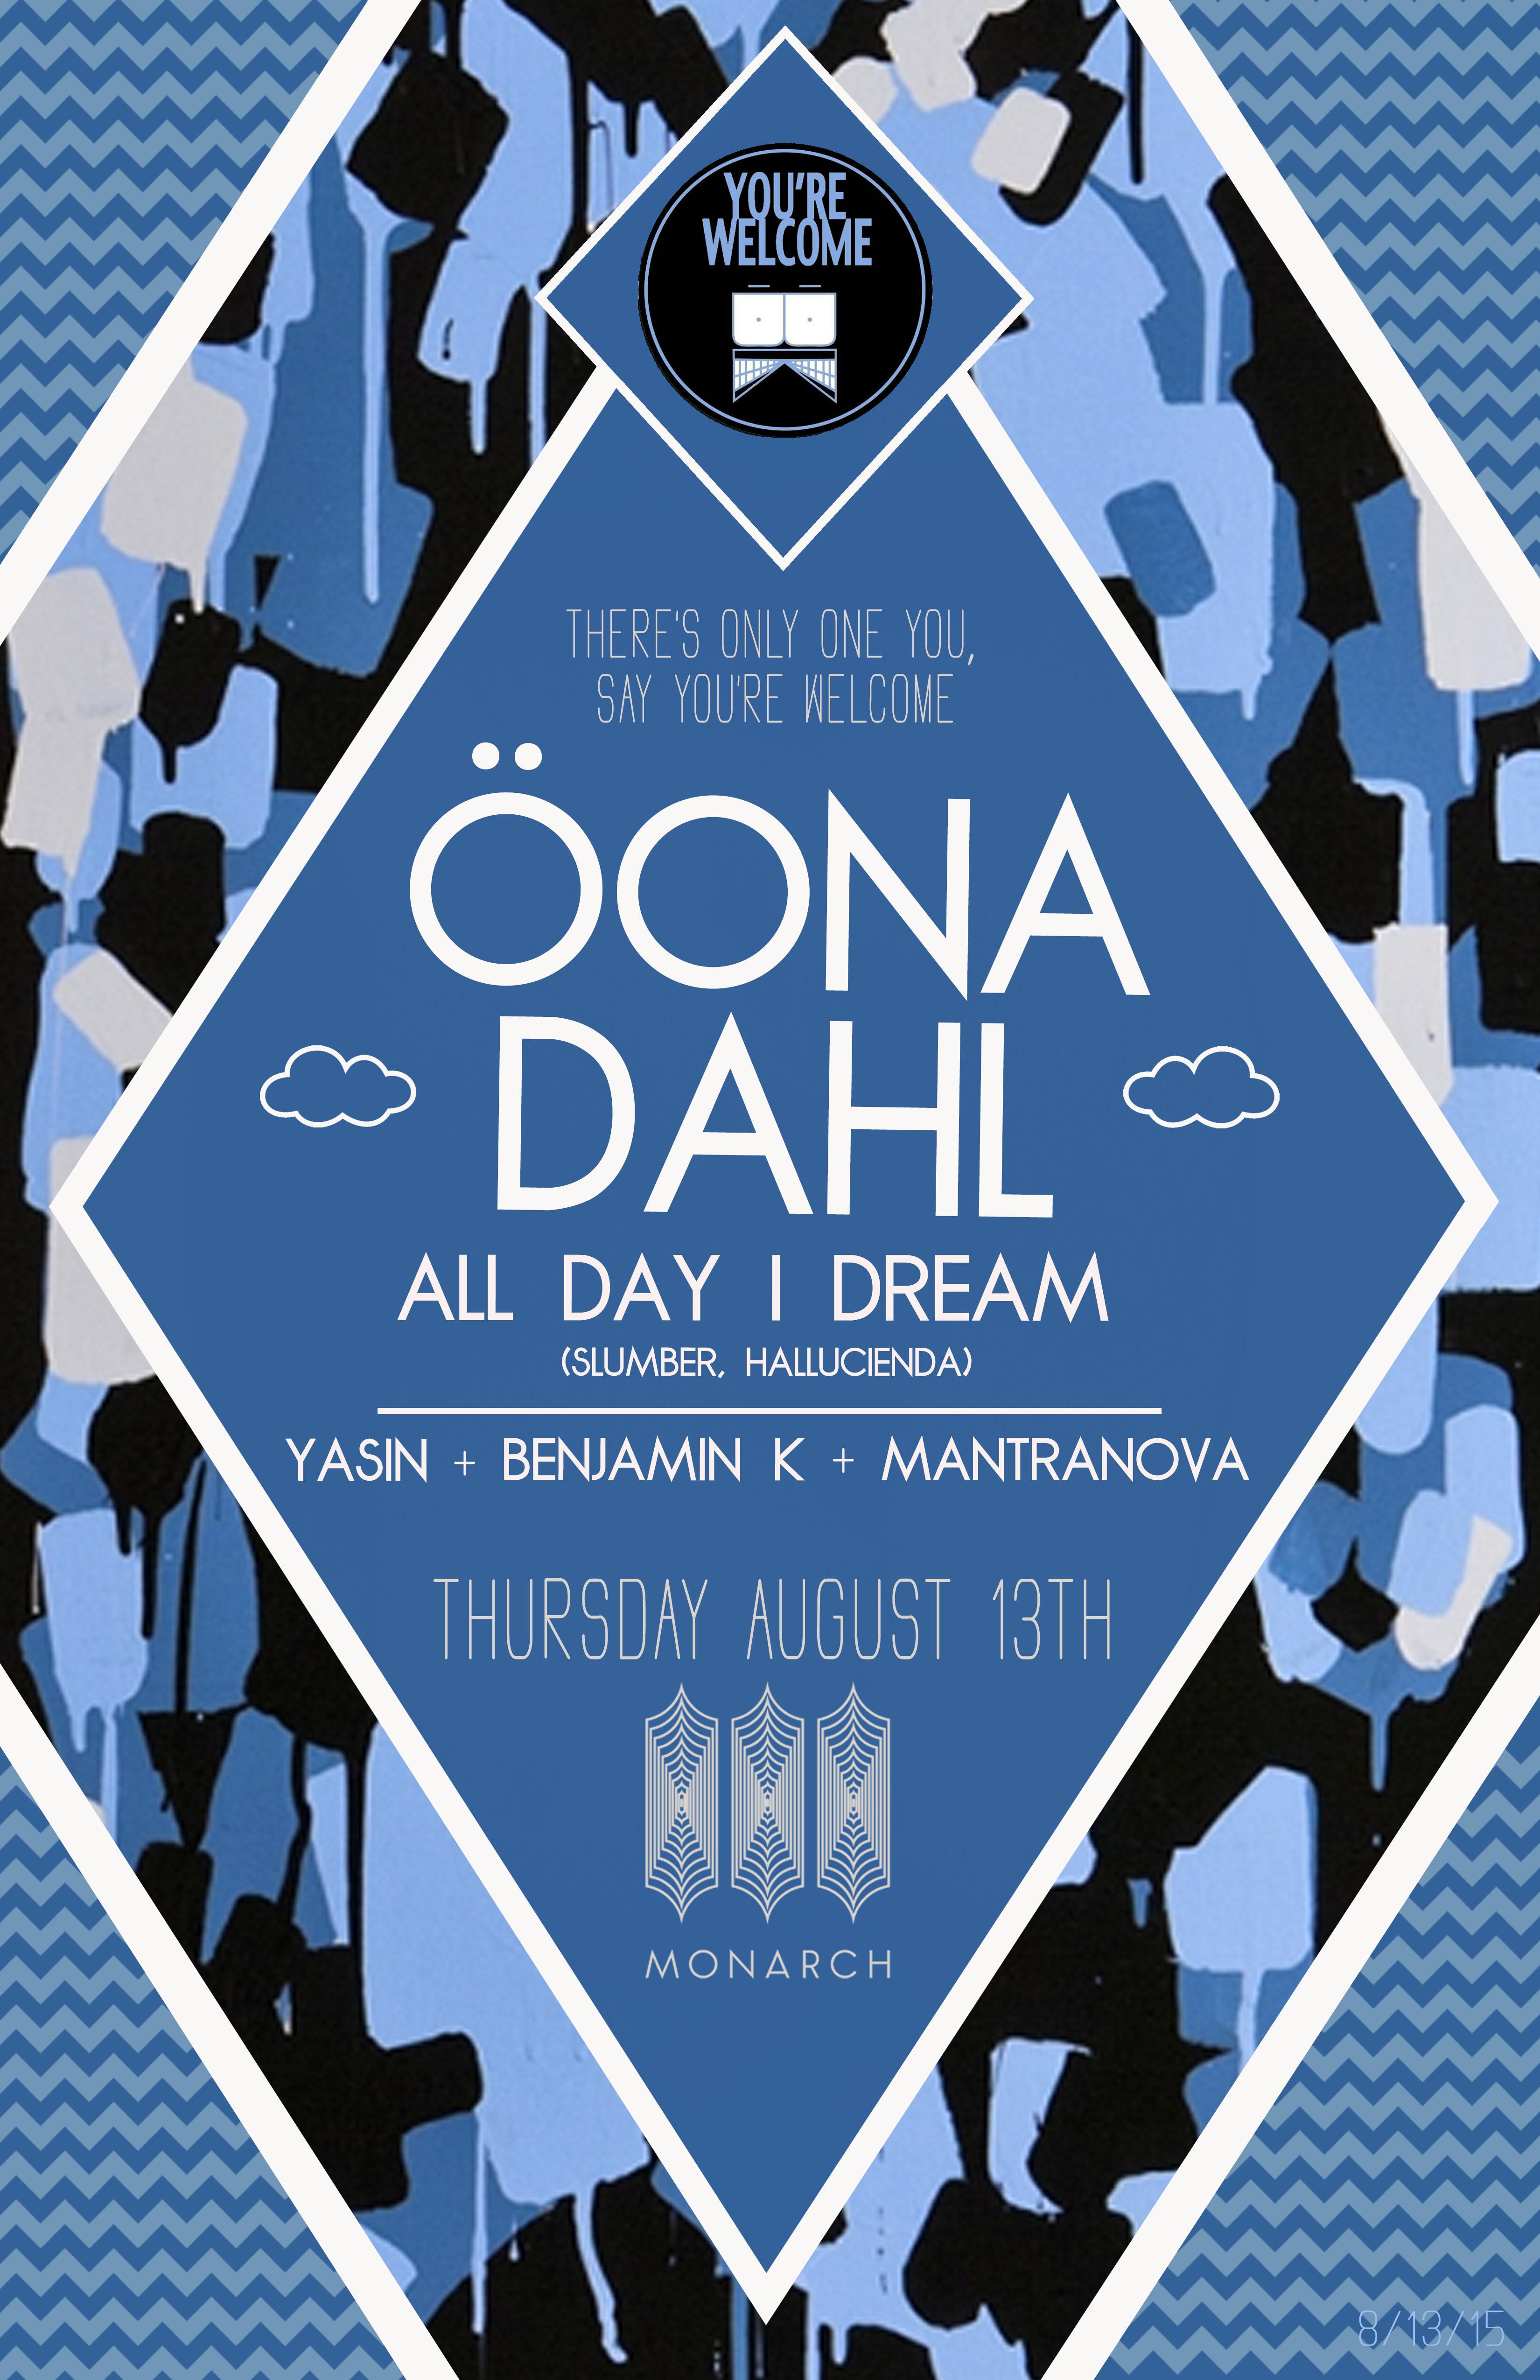 YW-Oona Dahl-8-13-15